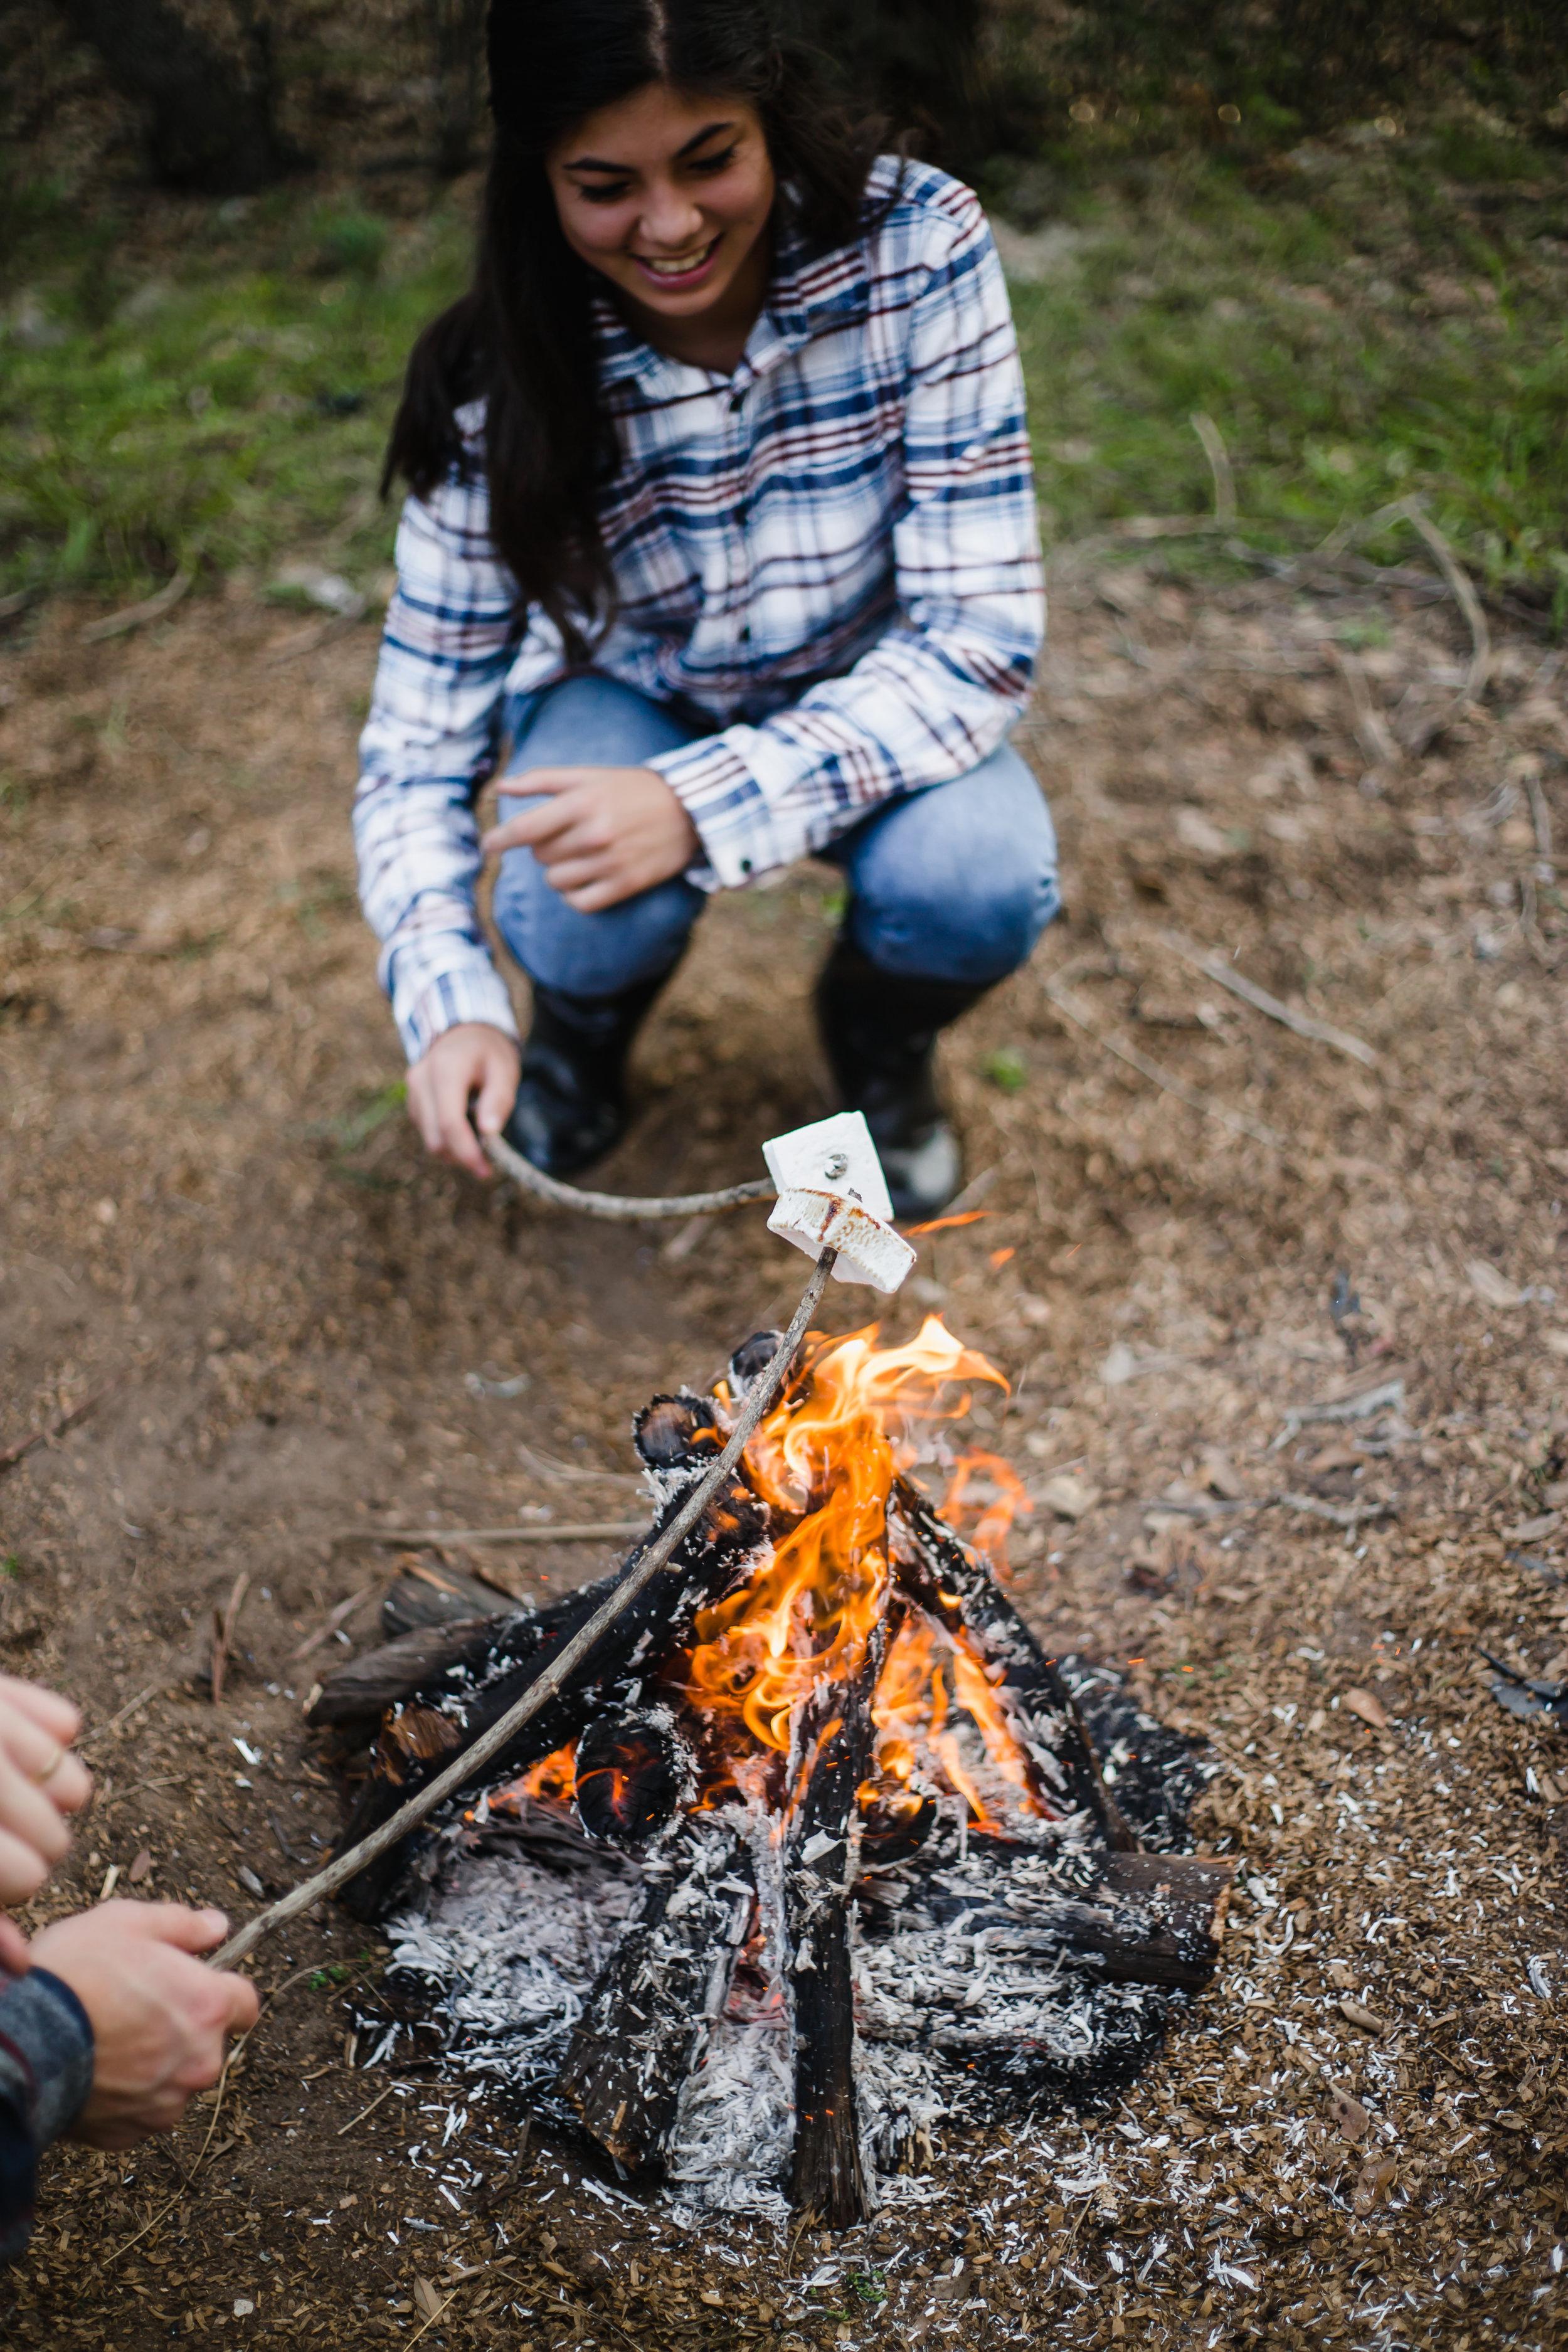 peppermint_marshmallows_bonfire-45.jpg